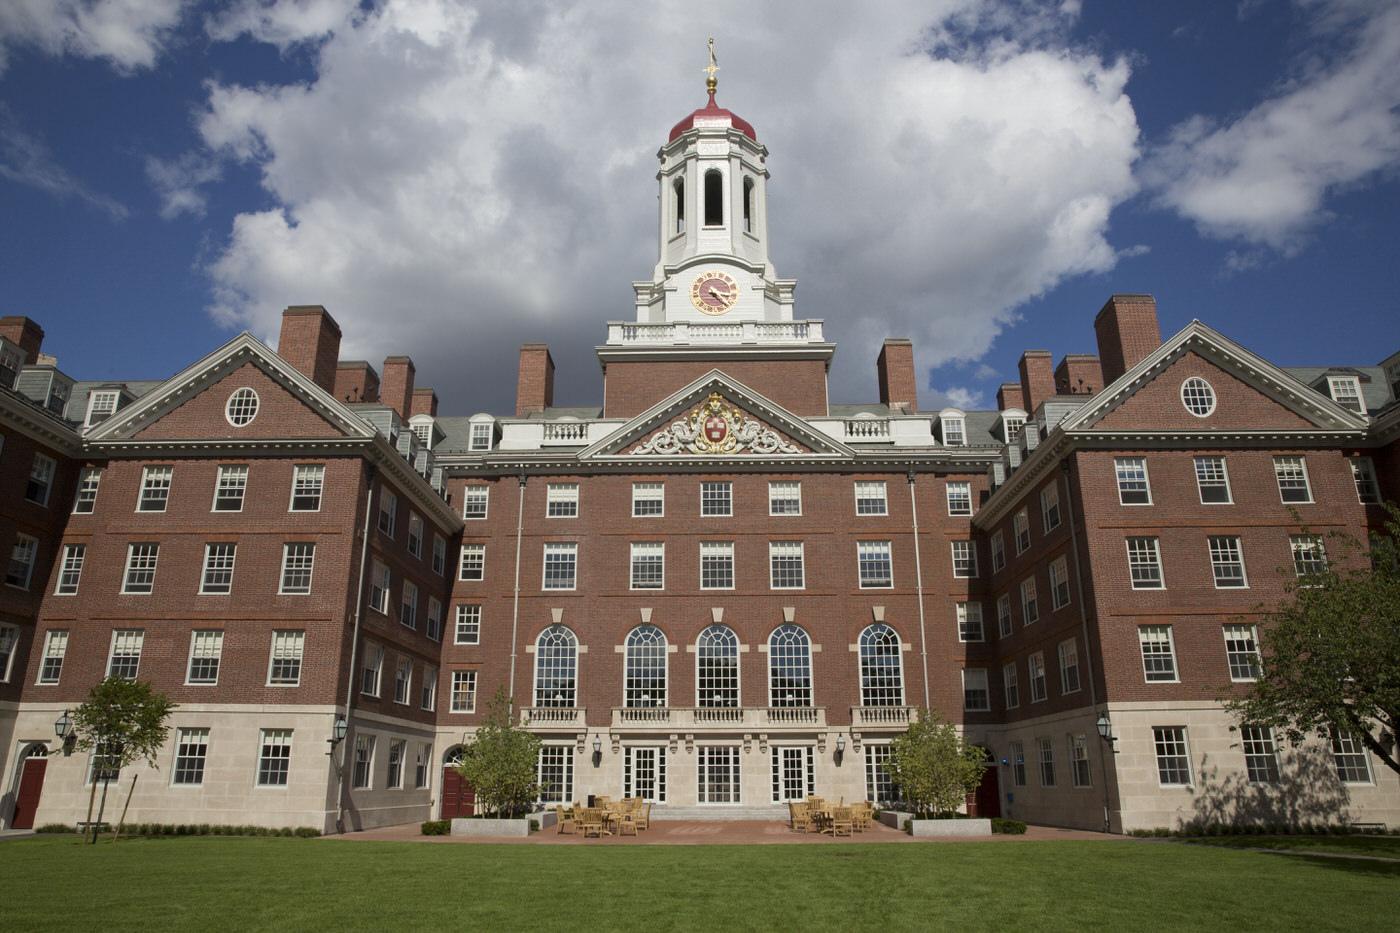 Harvard 哈佛大學 - 是College還是University?美國第一間學院 - 美國大學|申請大學|百大名校|國際學校|XL ACADEMY|國外留學|英文教學